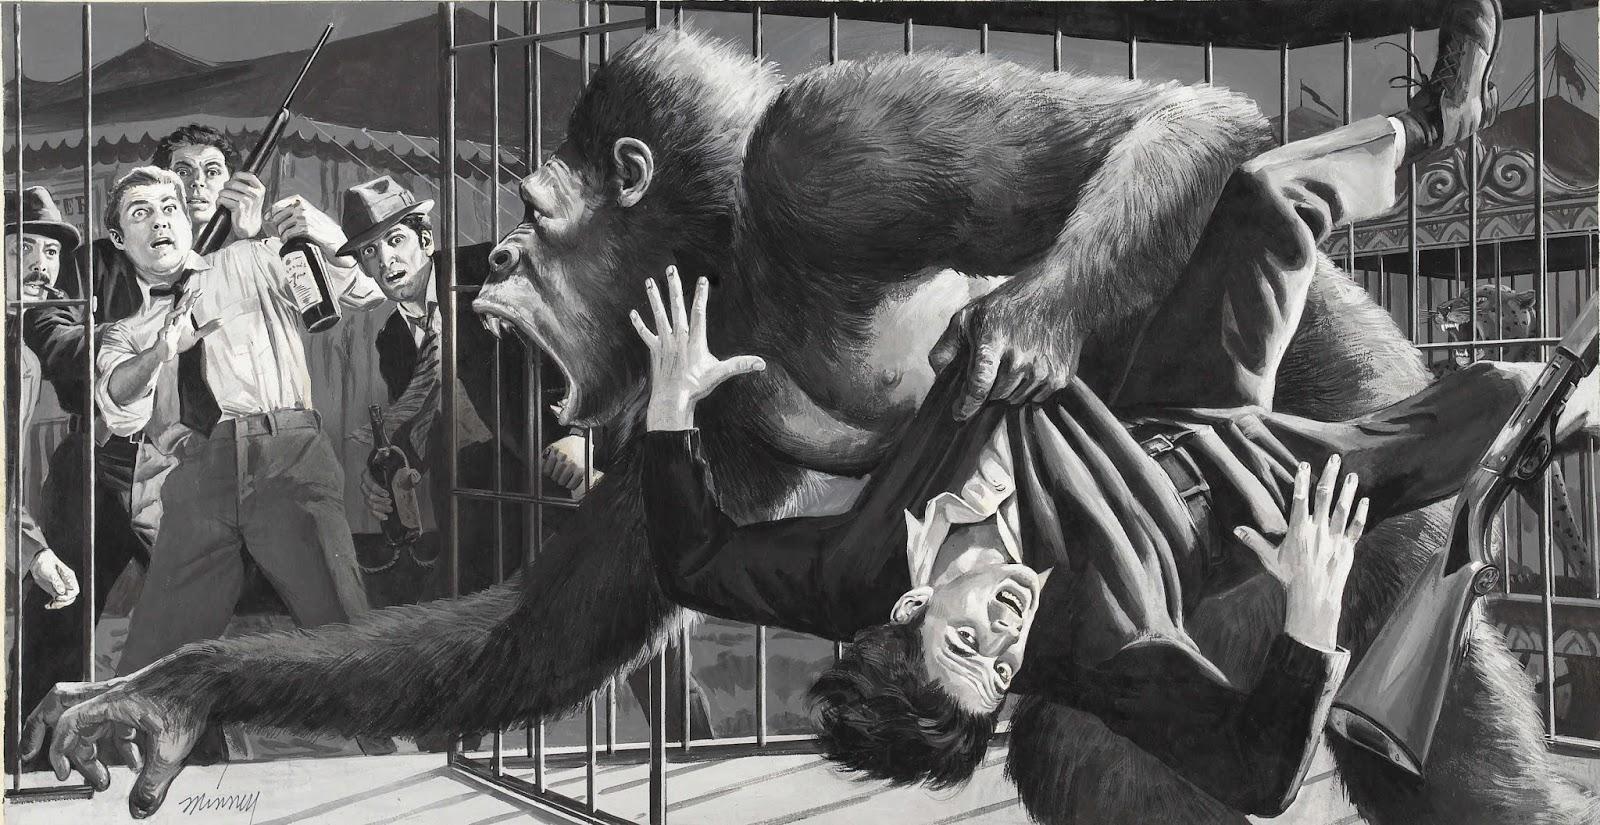 BRUCE MINNEY (American b. 1928) Untitled, c. 1973